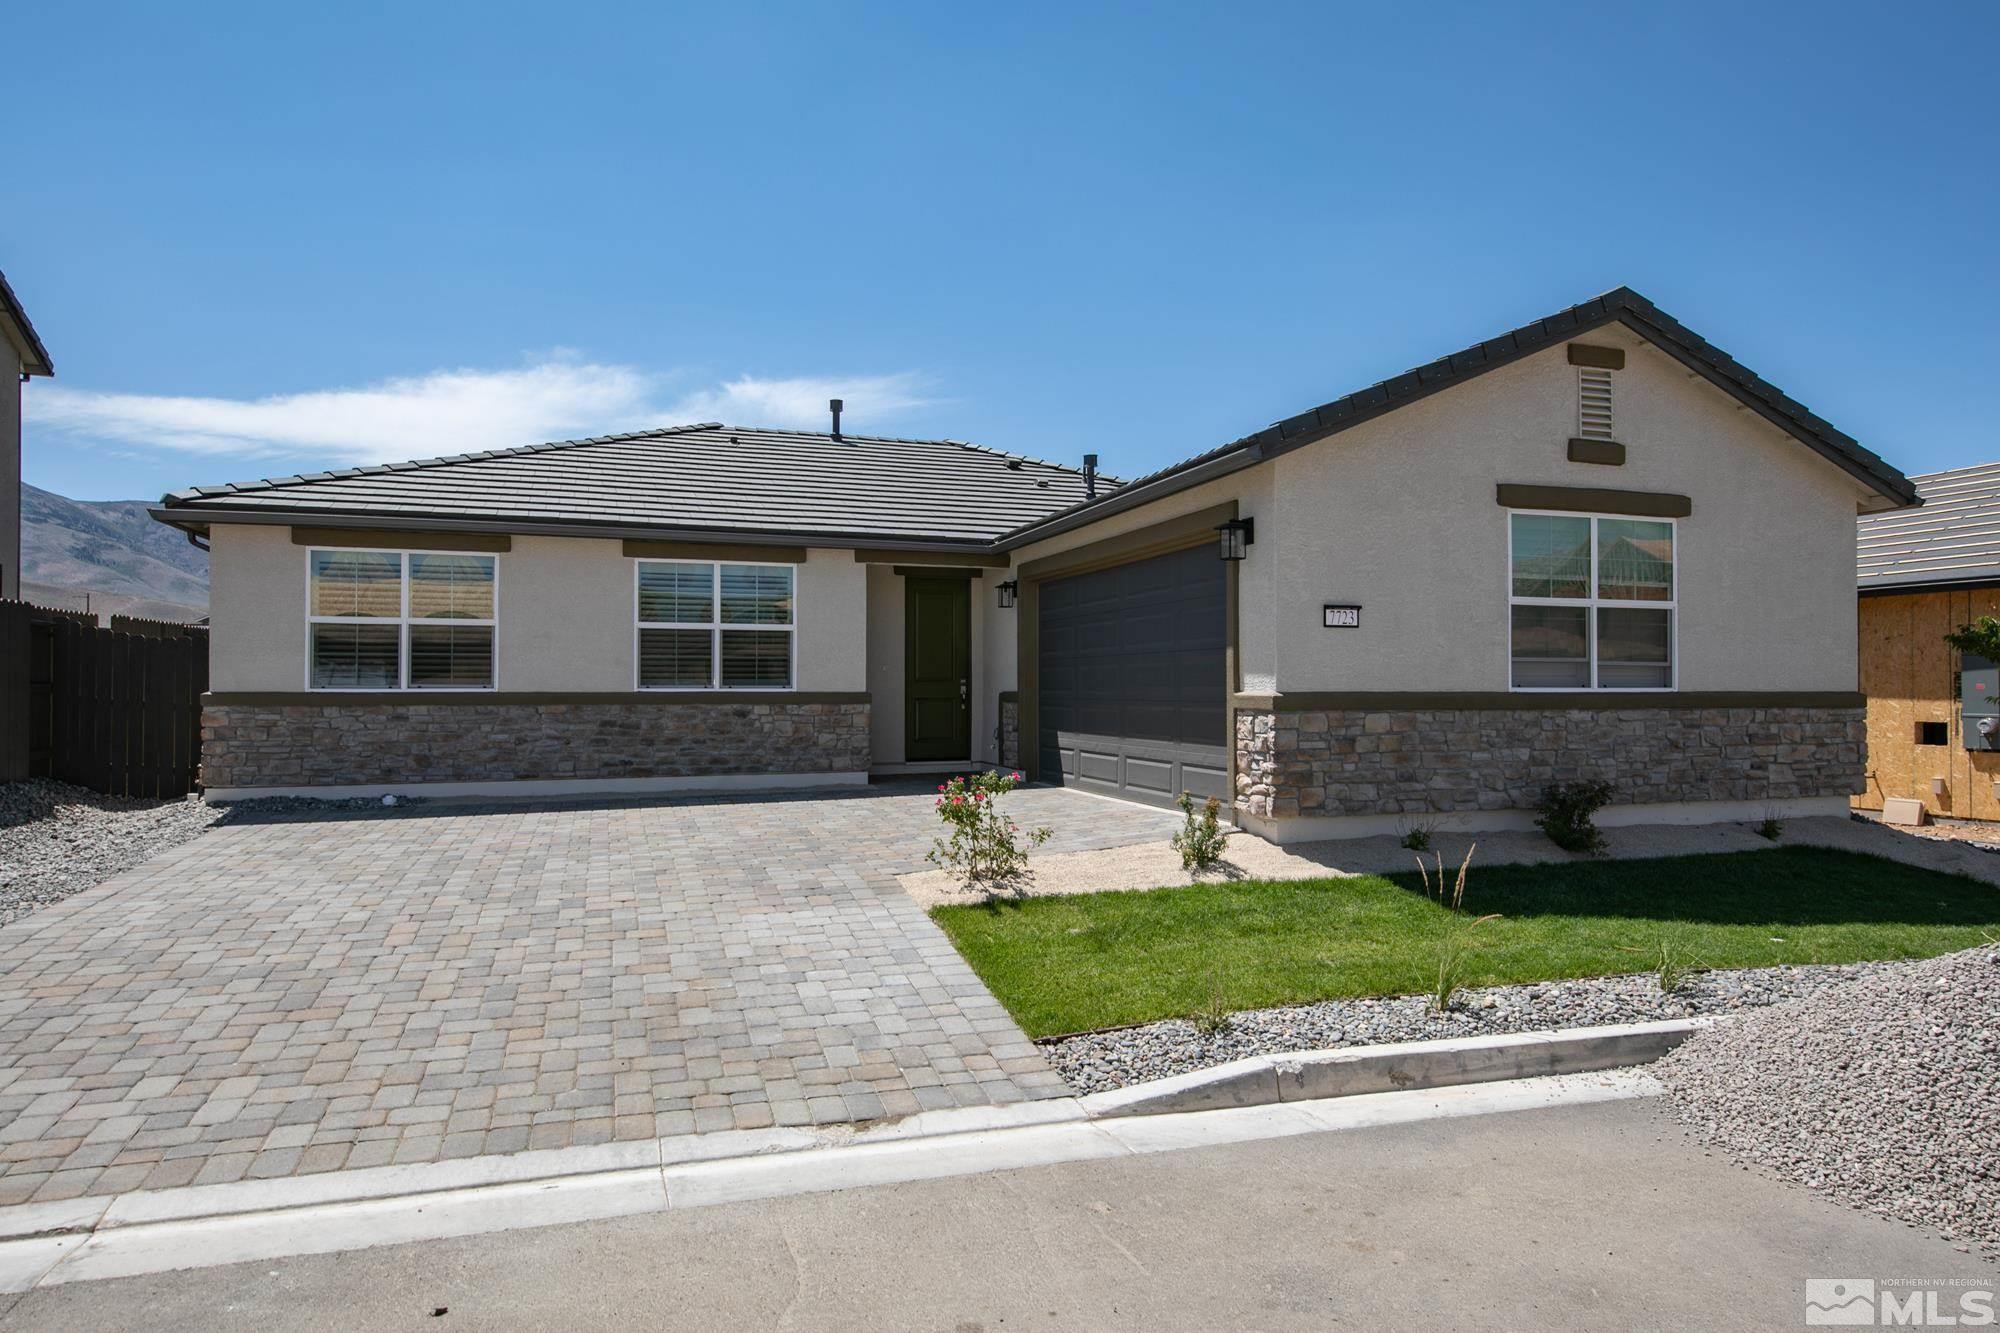 Image for 7723 Enclave Key Rd., Reno, NV 89506